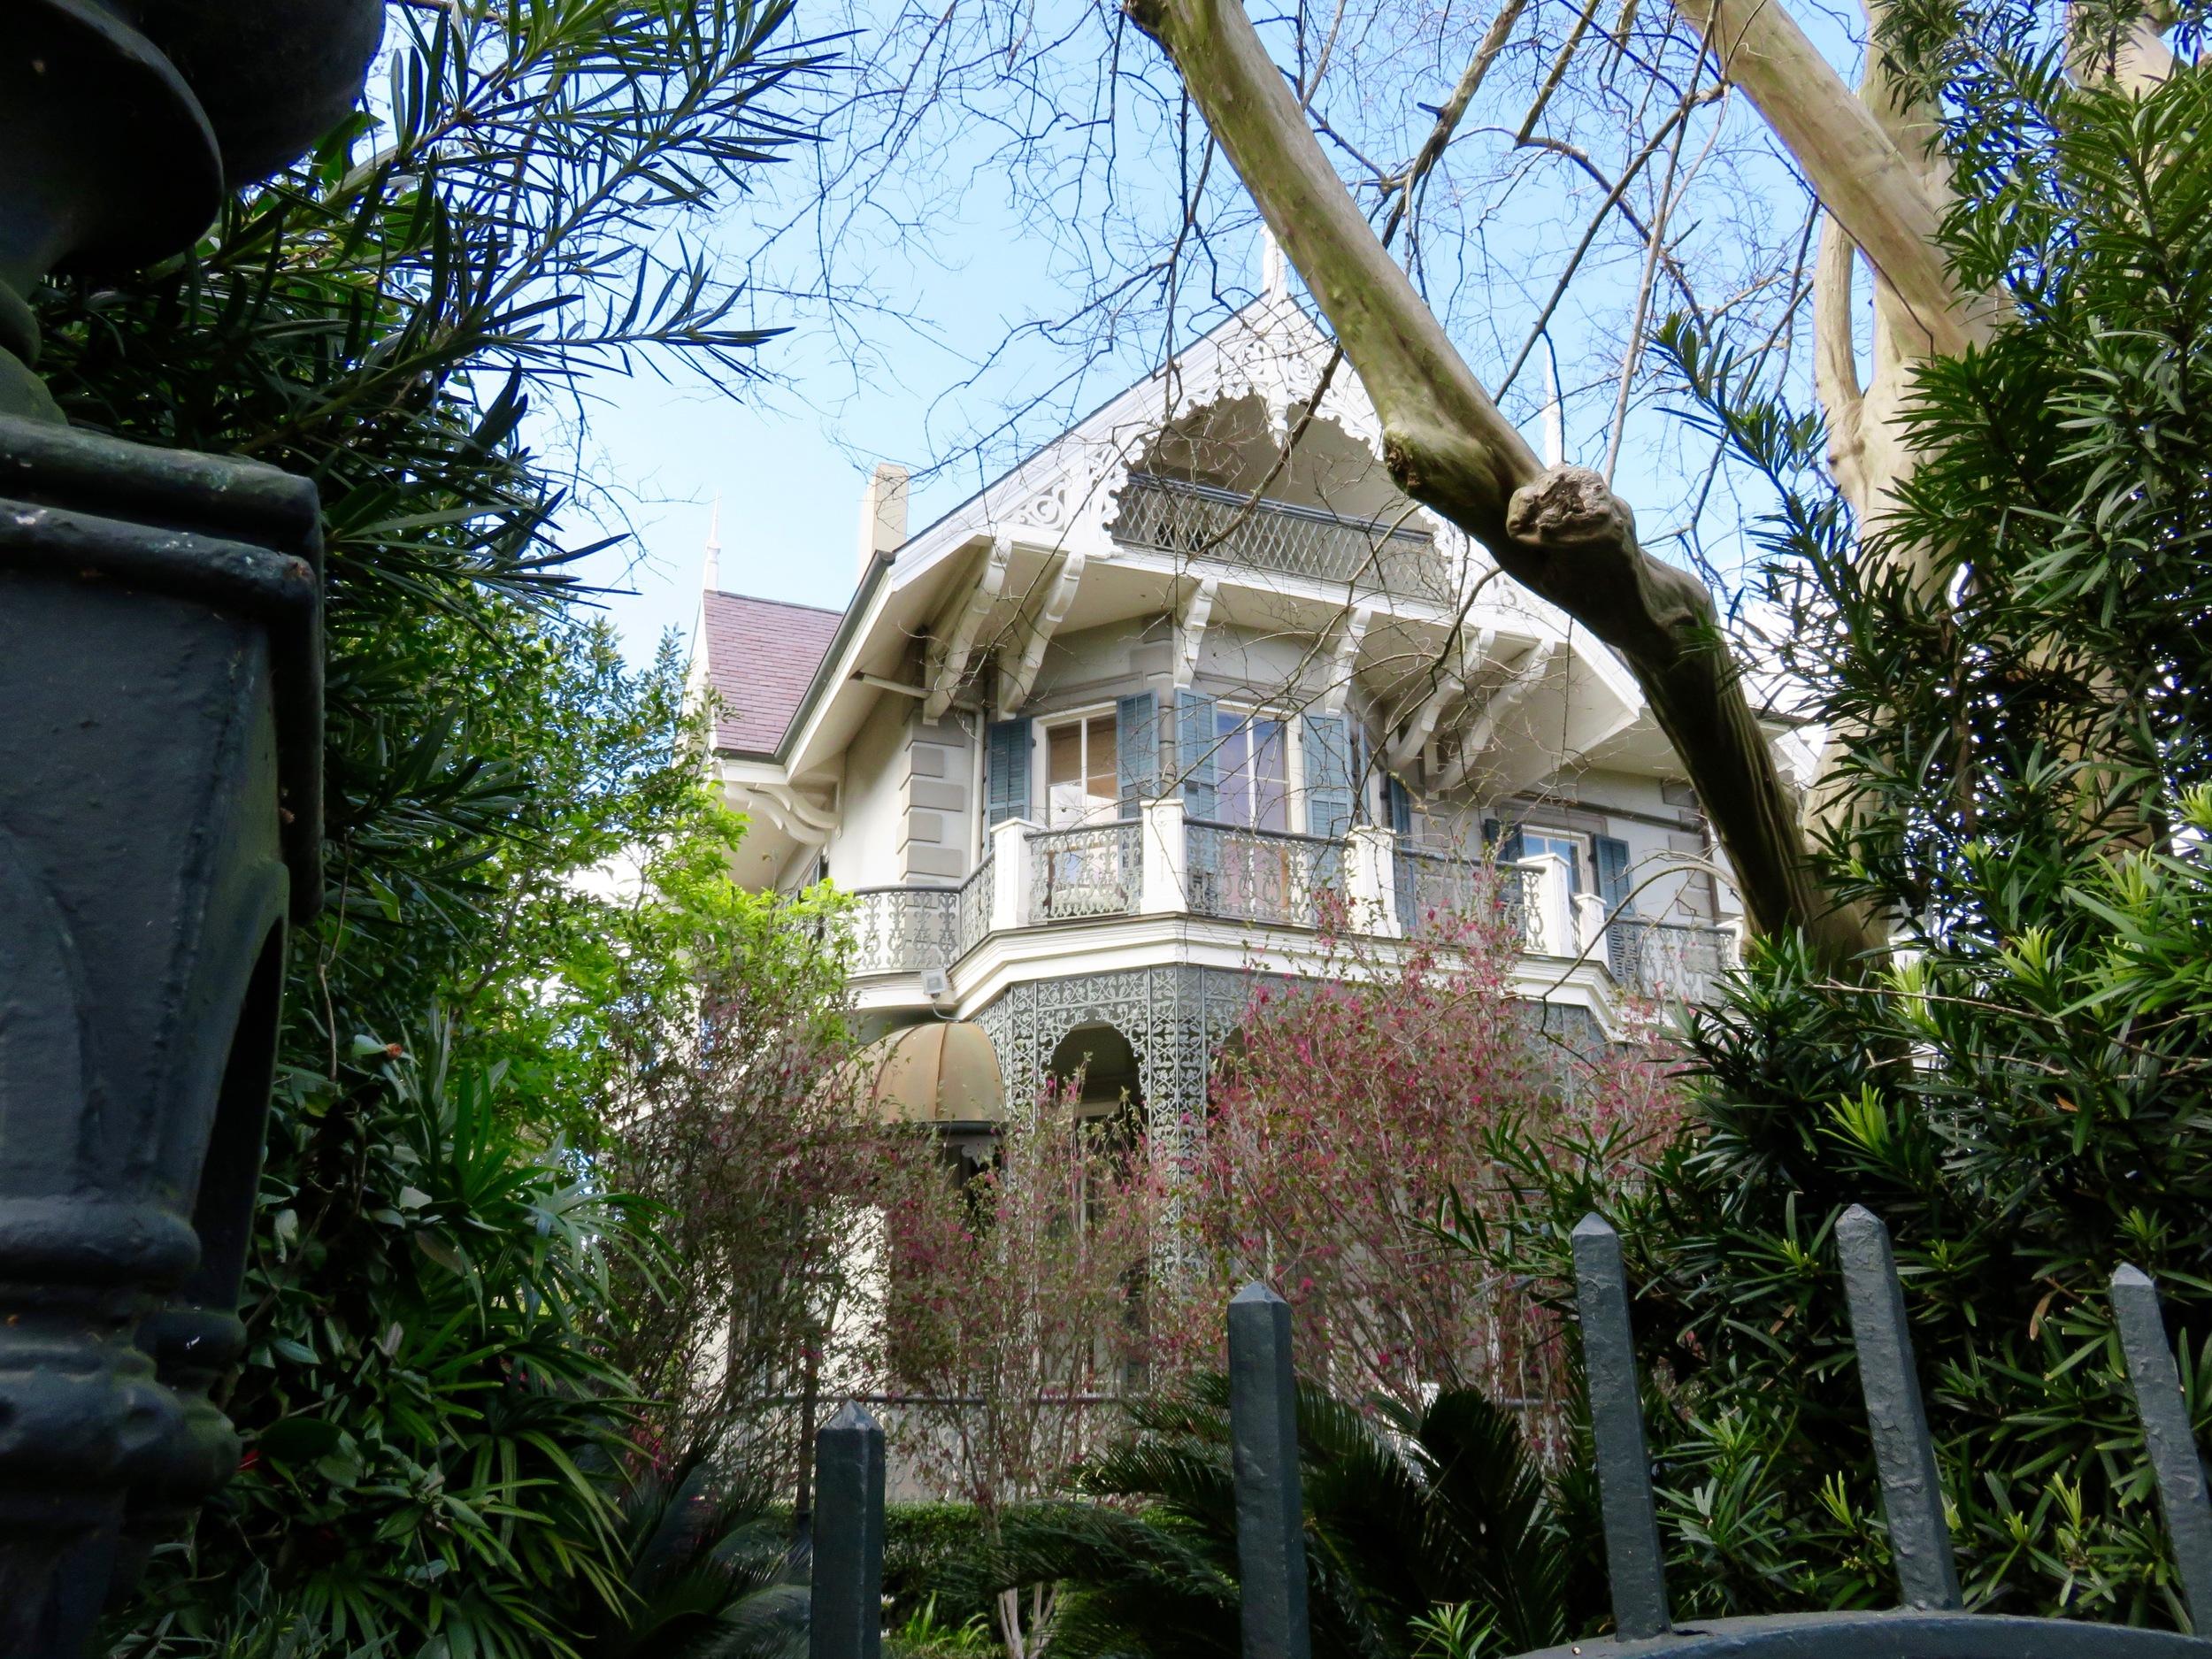 Sandra Bullock's home, Garden District New Orleans.